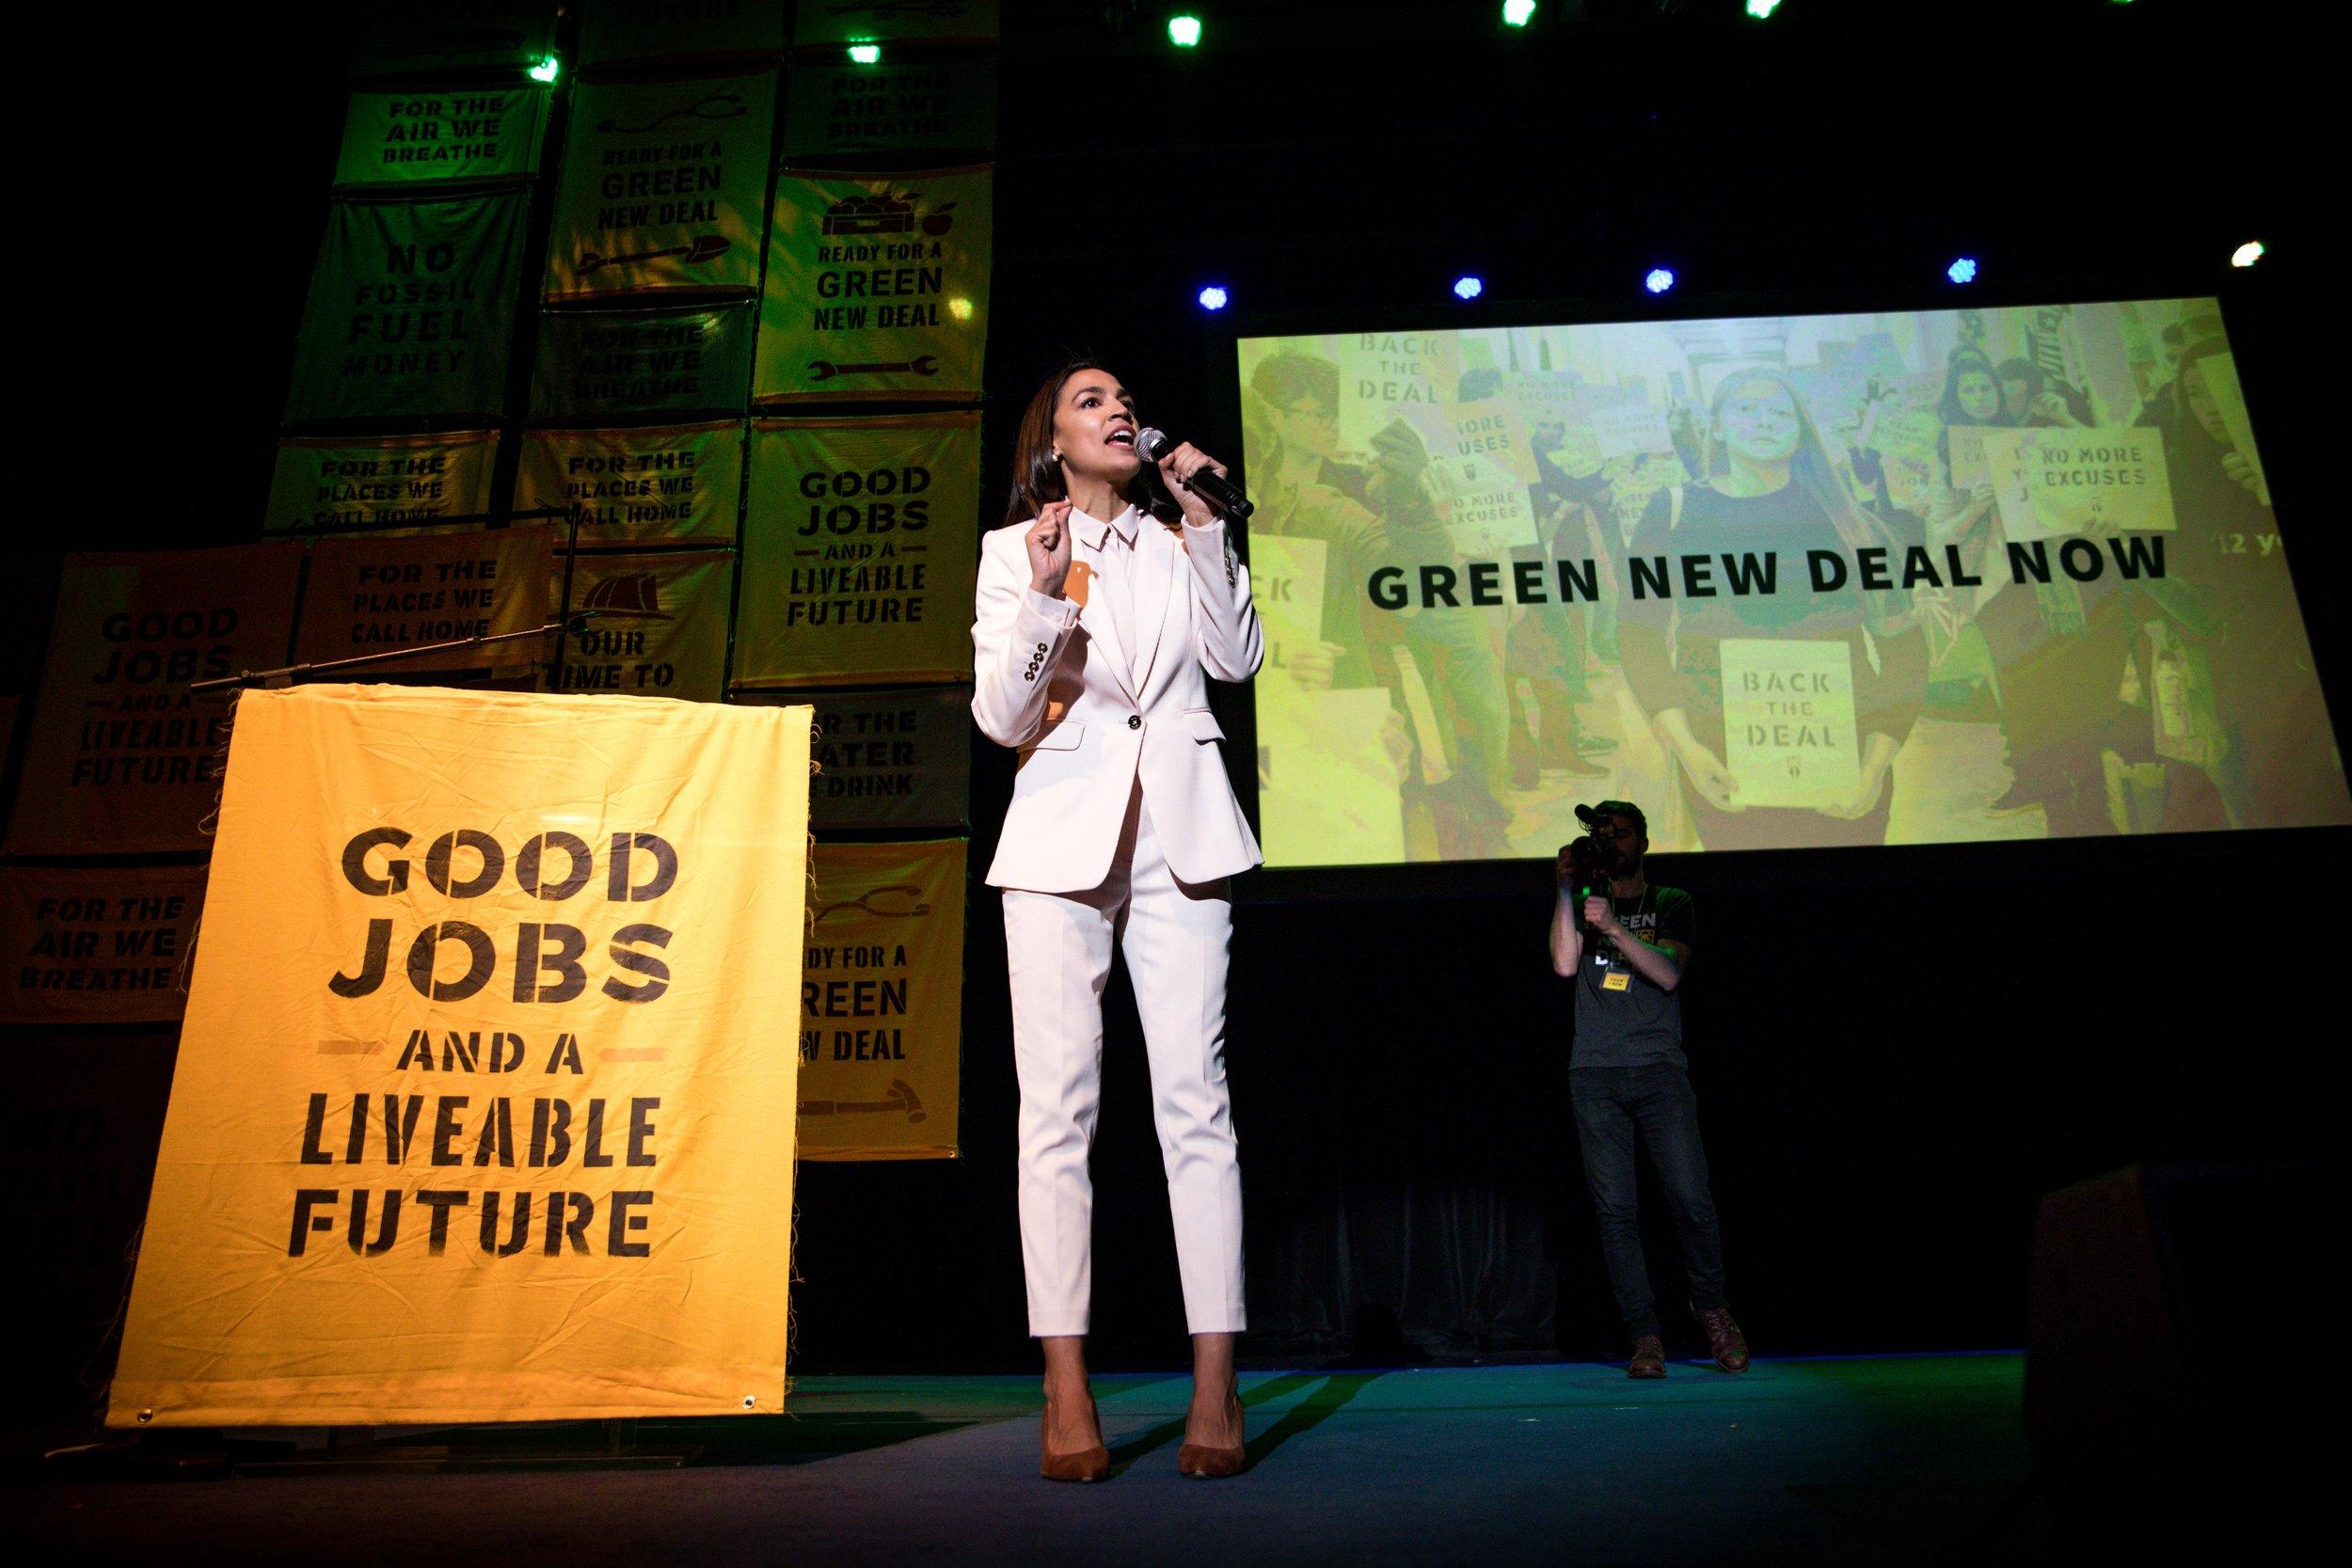 House Representative Alexandria Ocasio-Cortez